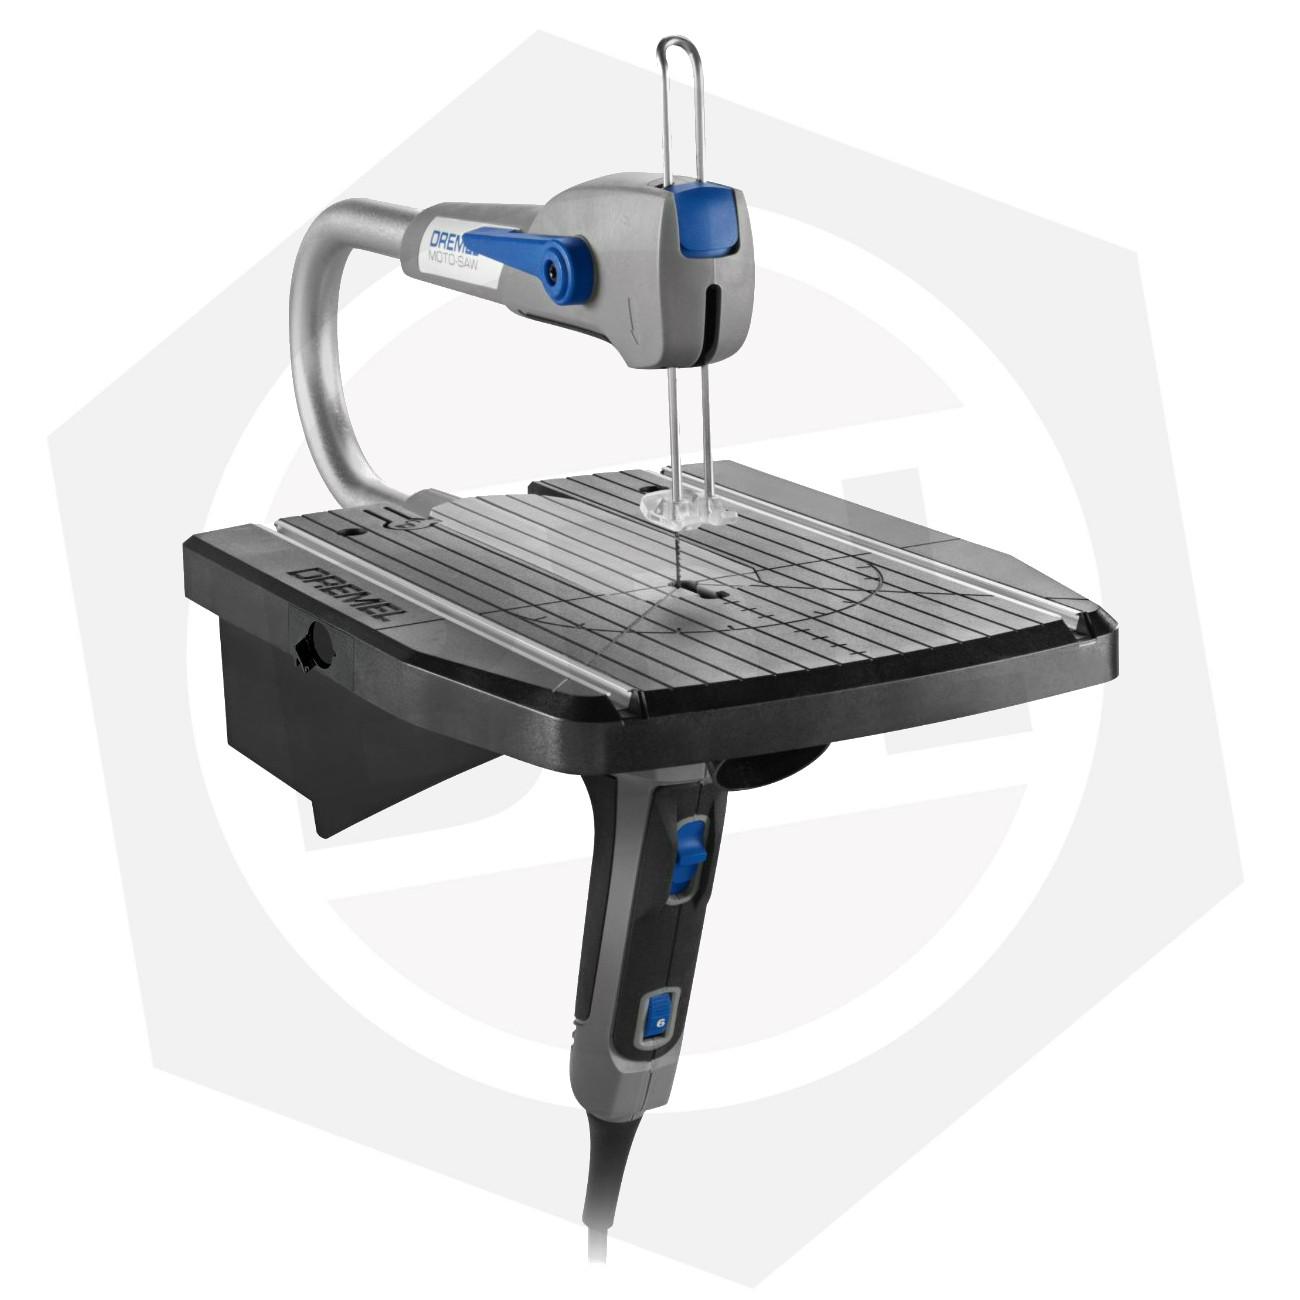 Sierra Caladora Dremel Moto Saw Max MS20 - 10 Accesorios